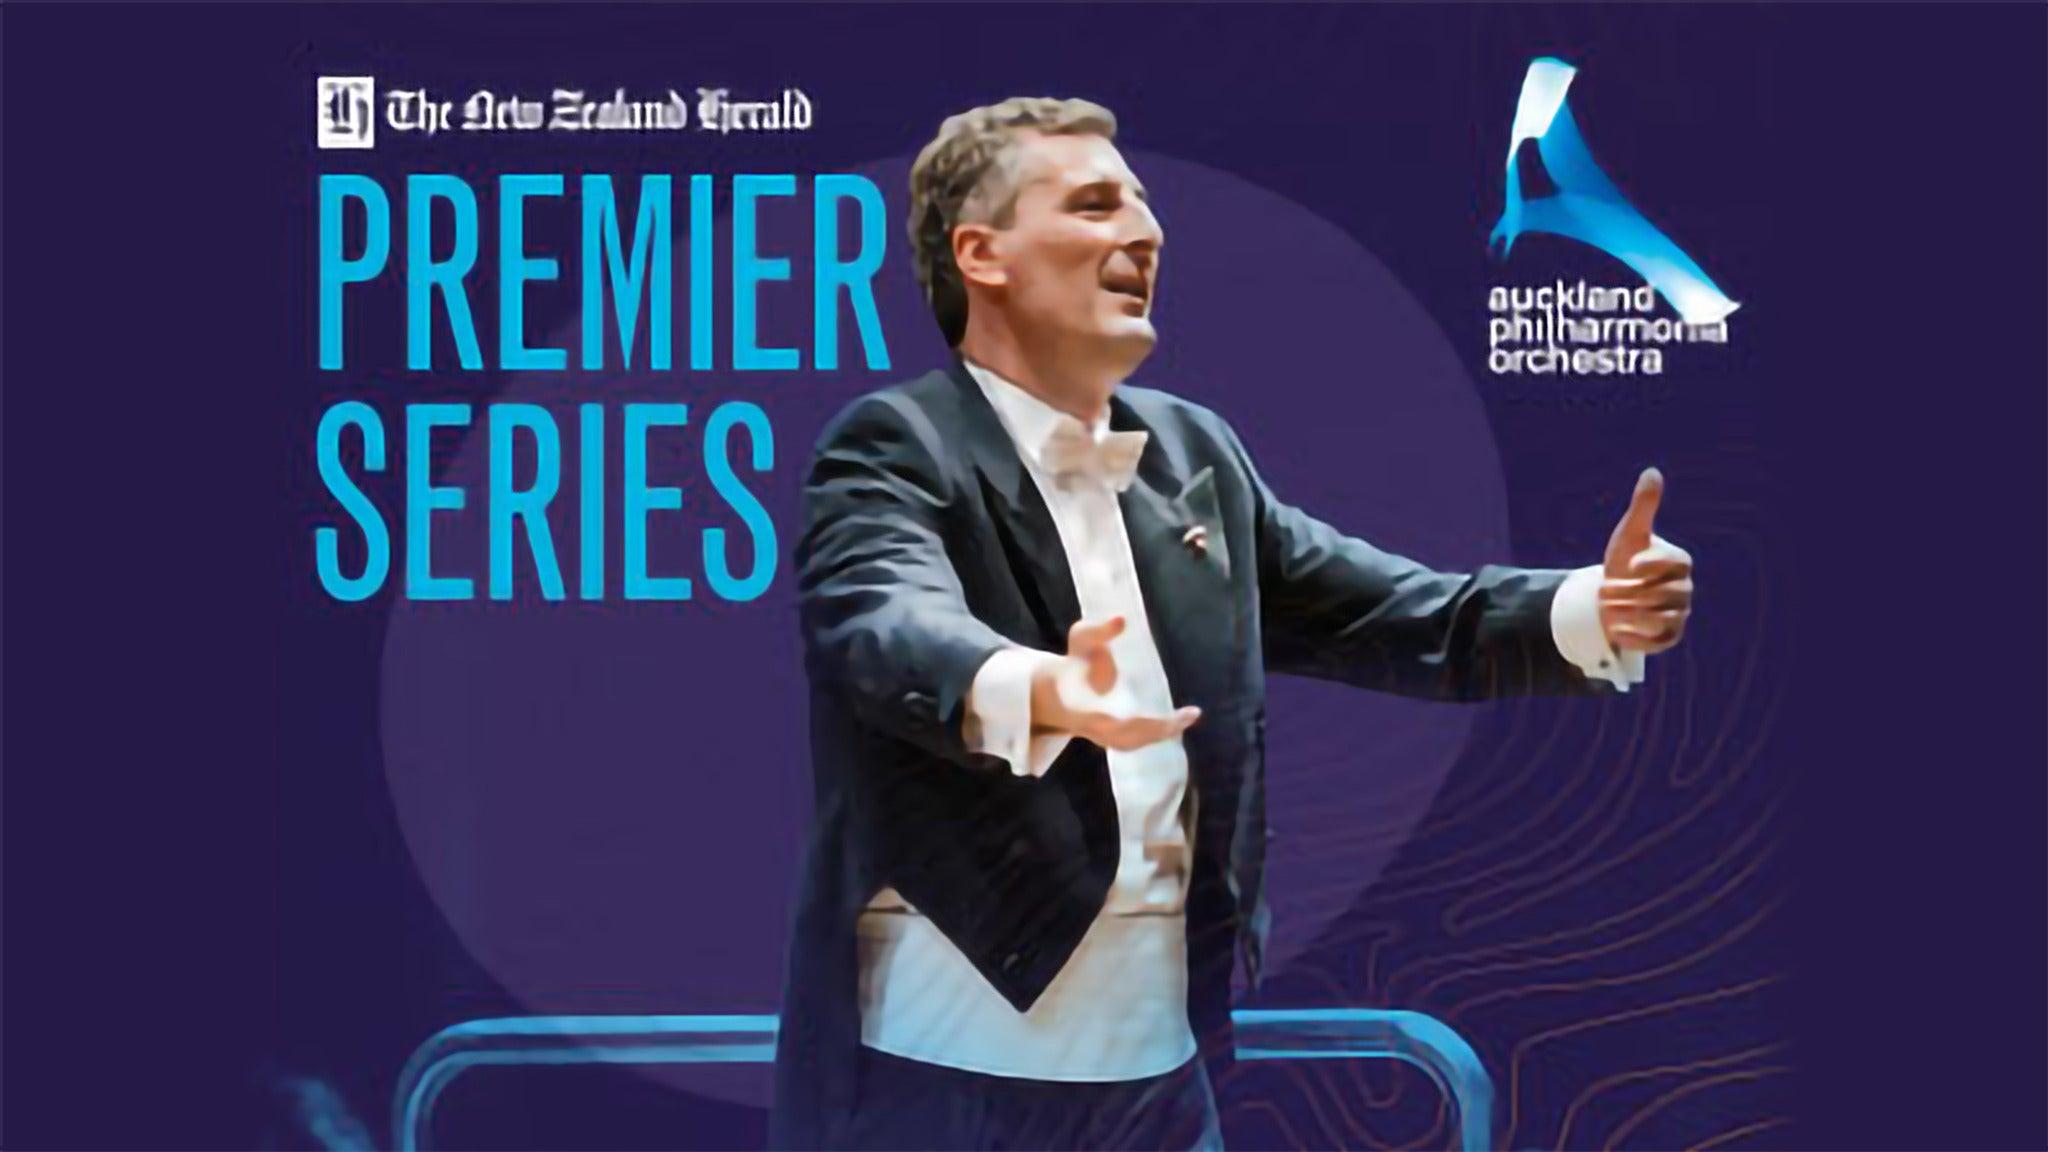 The New Zealand Herald Premier Series - Ma vlast